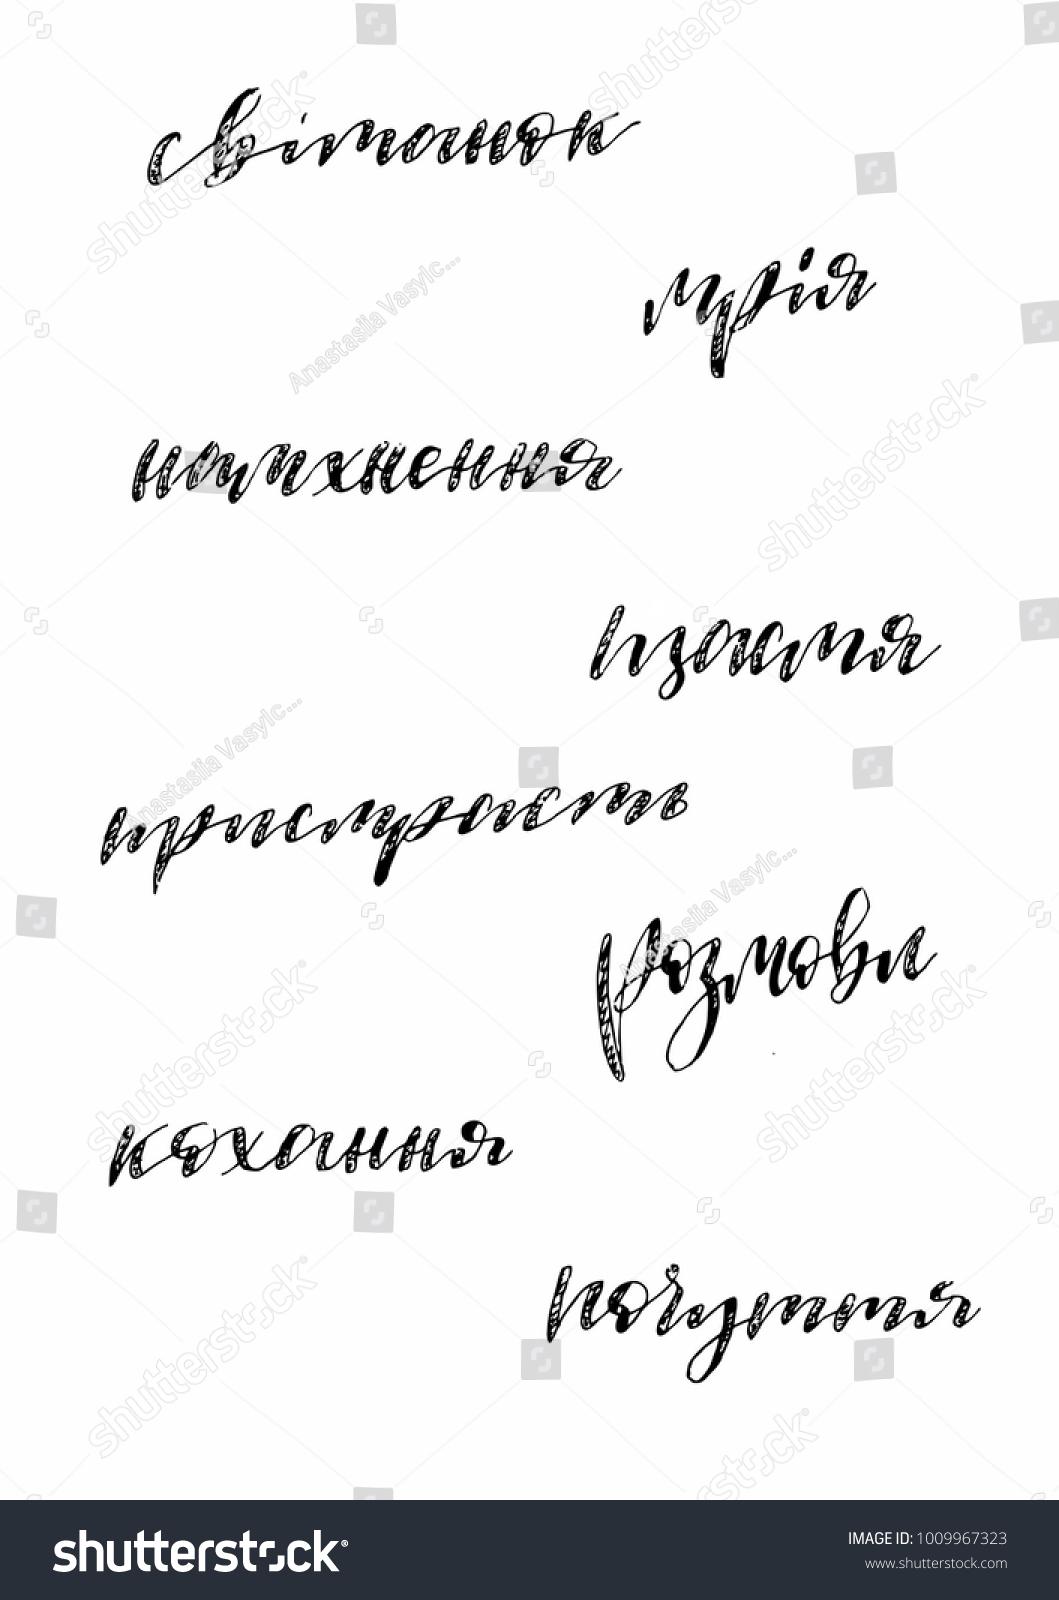 Ukrainian Words Handwritten With Ballpen Sunrise Dream Inspiration Happiness P Ion